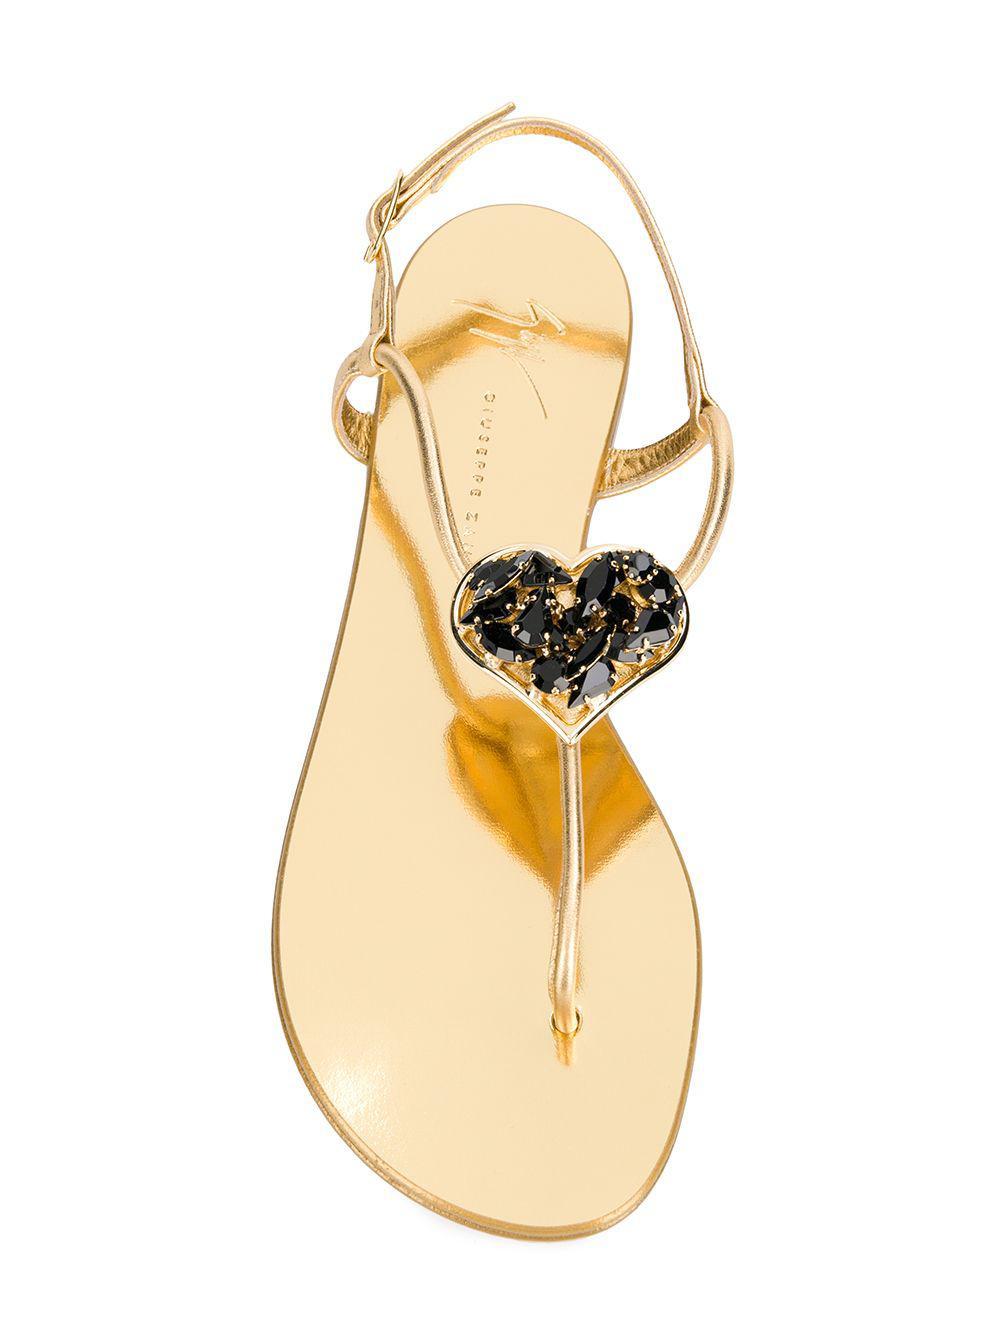 2086d5014 Giuseppe Zanotti - Metallic Heart Embellished Sandals - Lyst. View  fullscreen